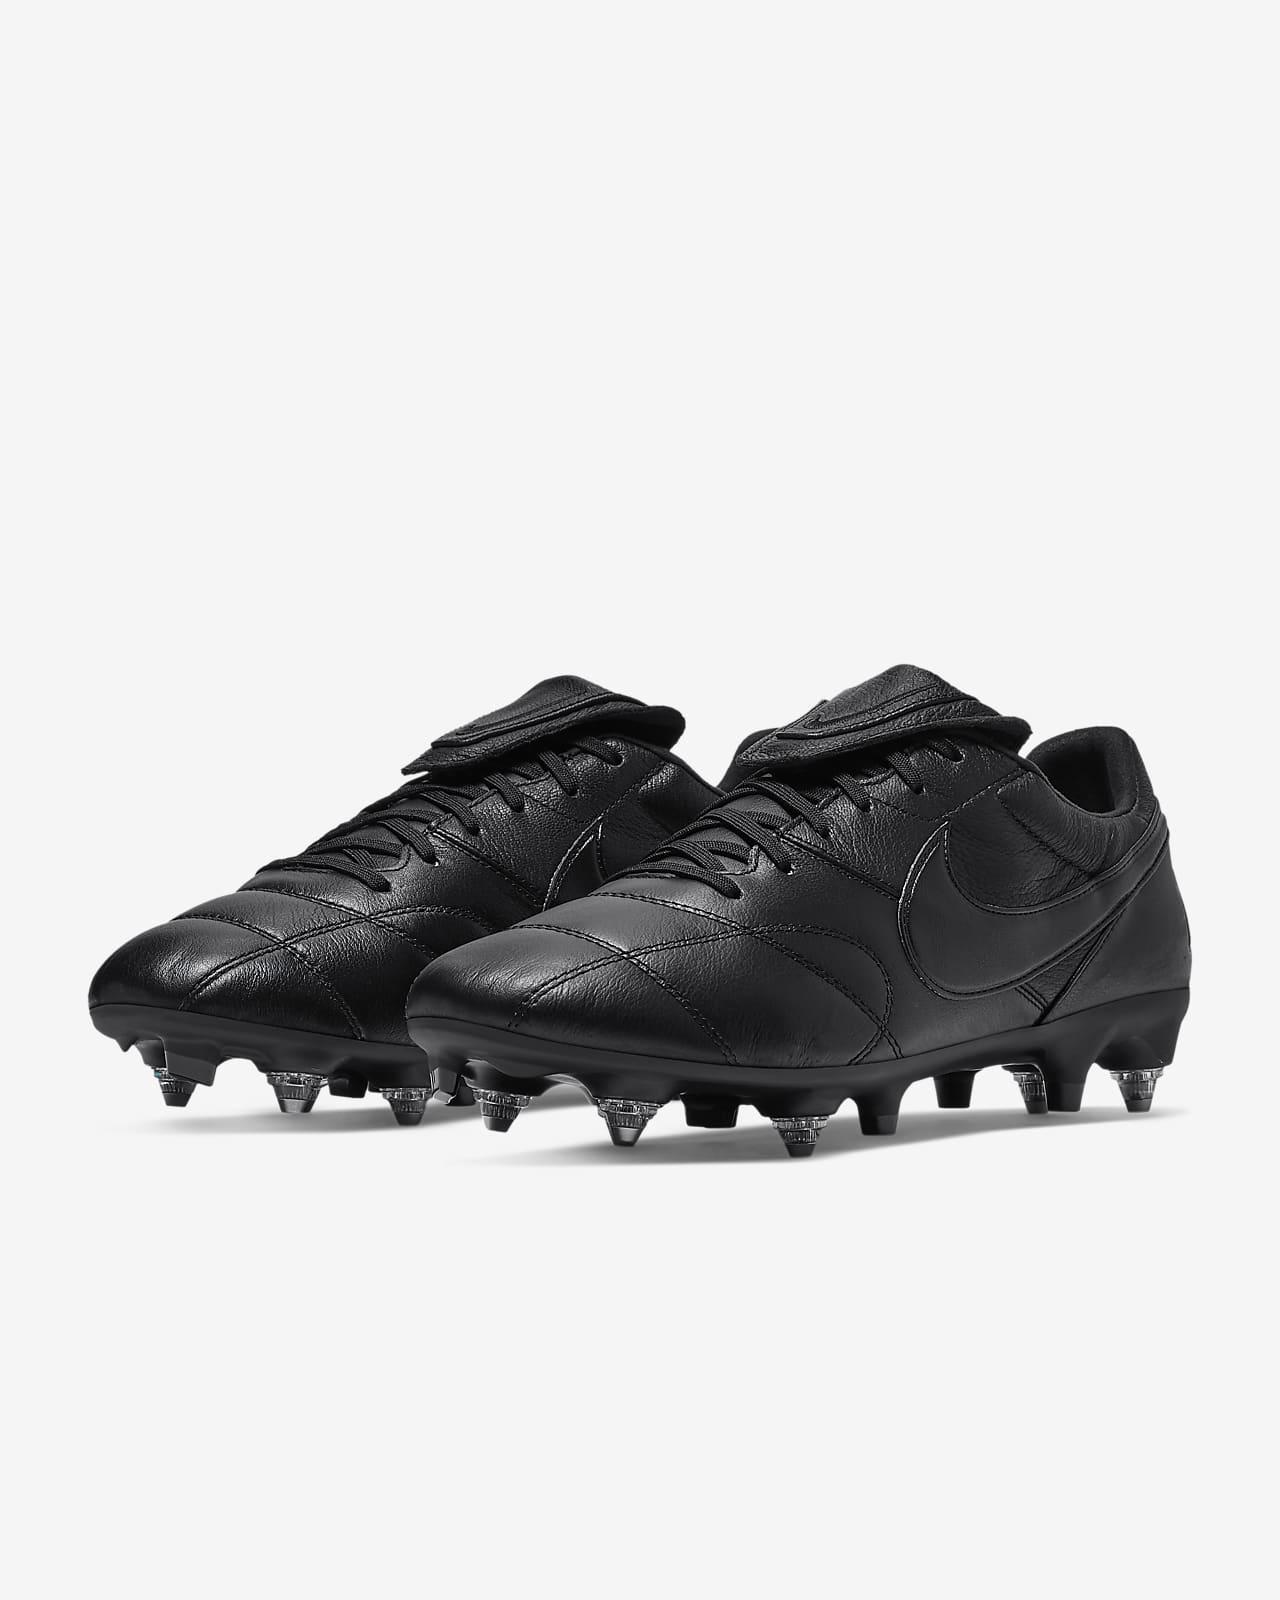 depositar profundidad éxtasis  Nike Premier 2 SG-Pro AC Soft-Ground Football Boot. Nike NL